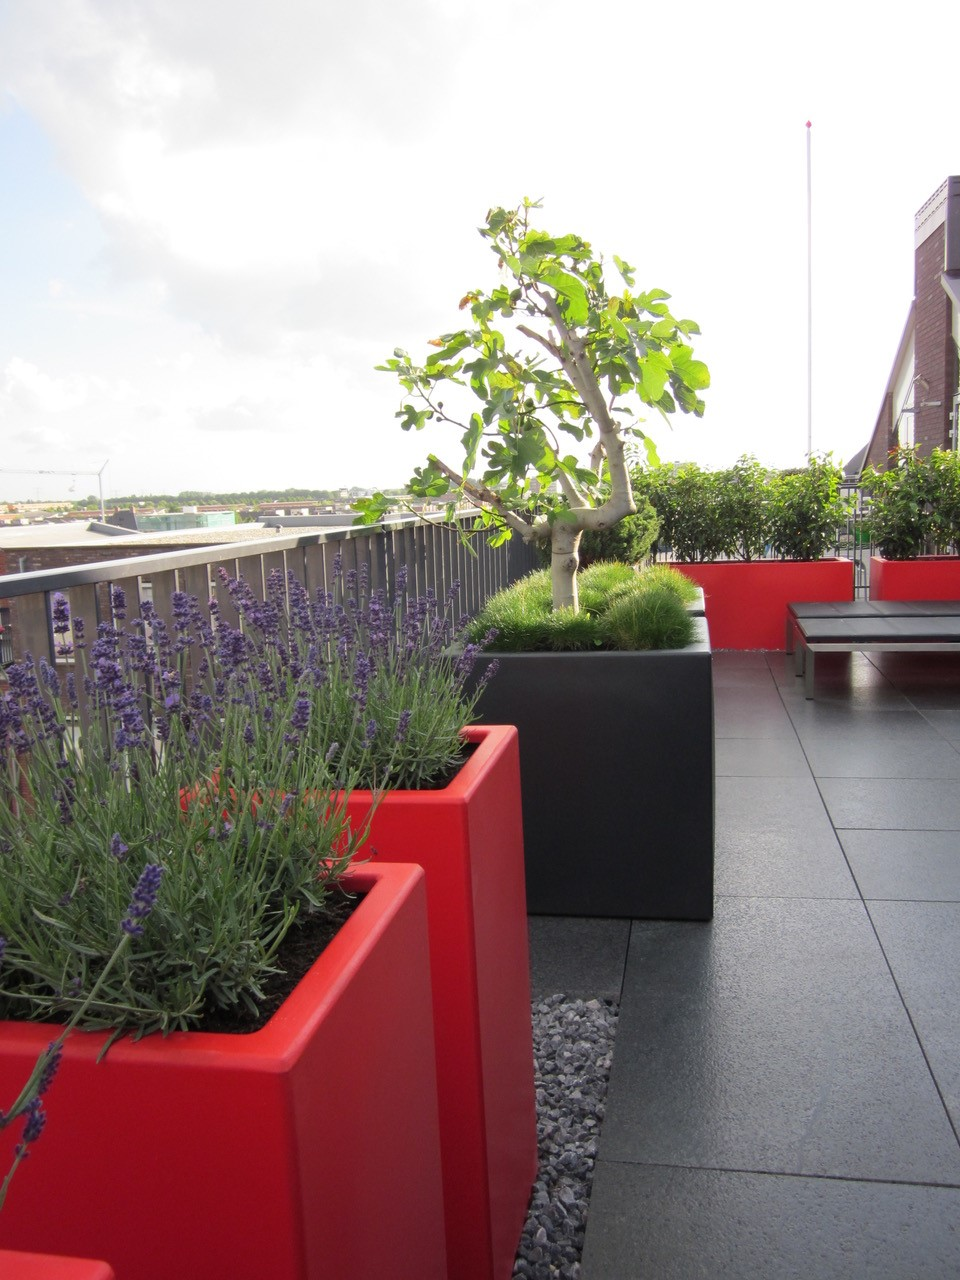 Colourful planters